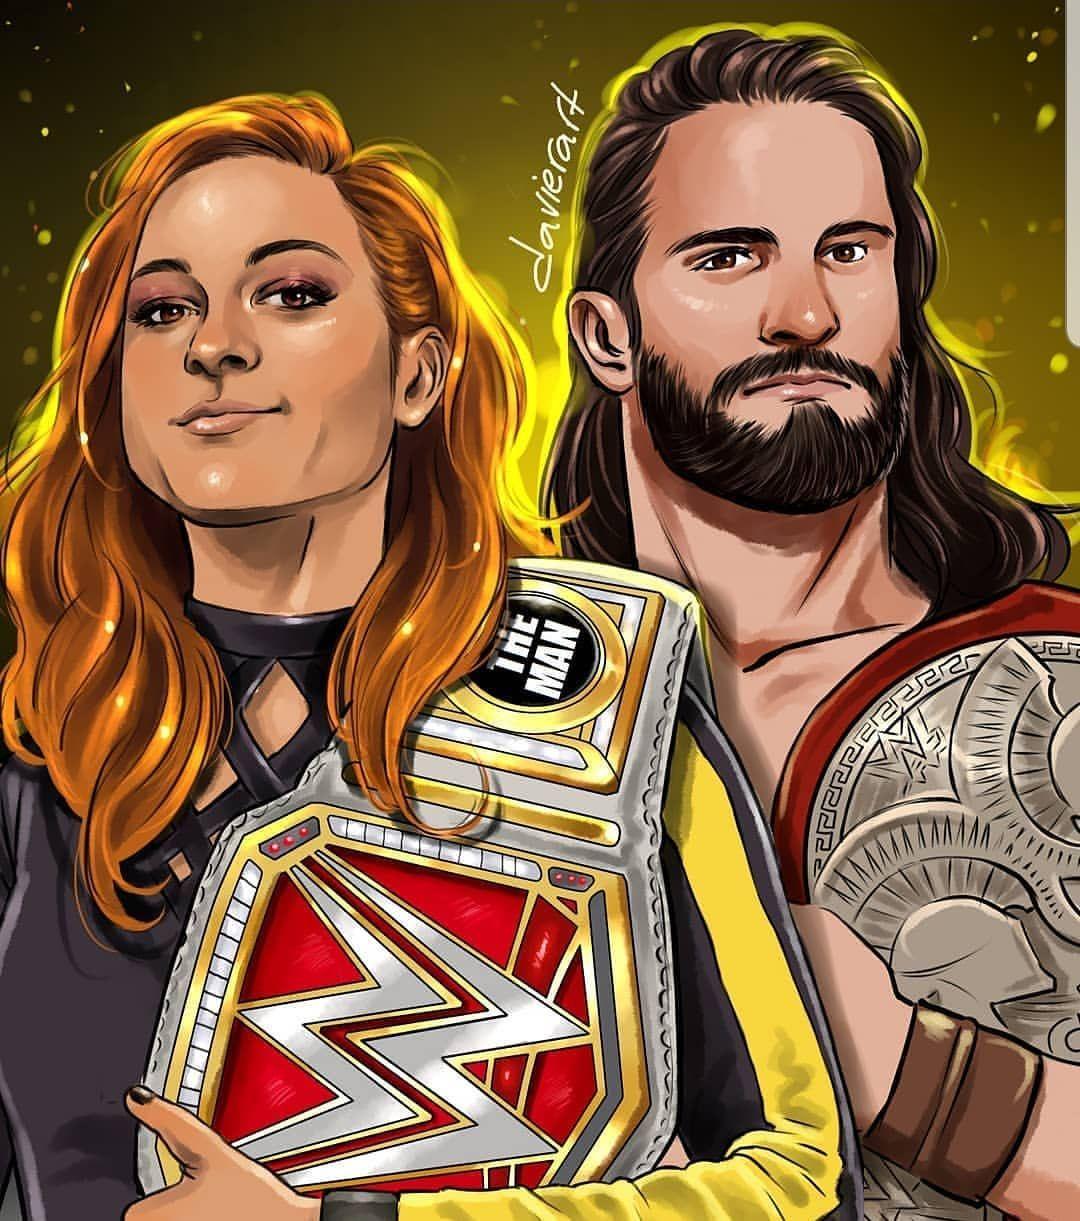 Very Creative Artwork Becky And Seth Becky Wwe Wwe Couples Wwe Seth Rollins